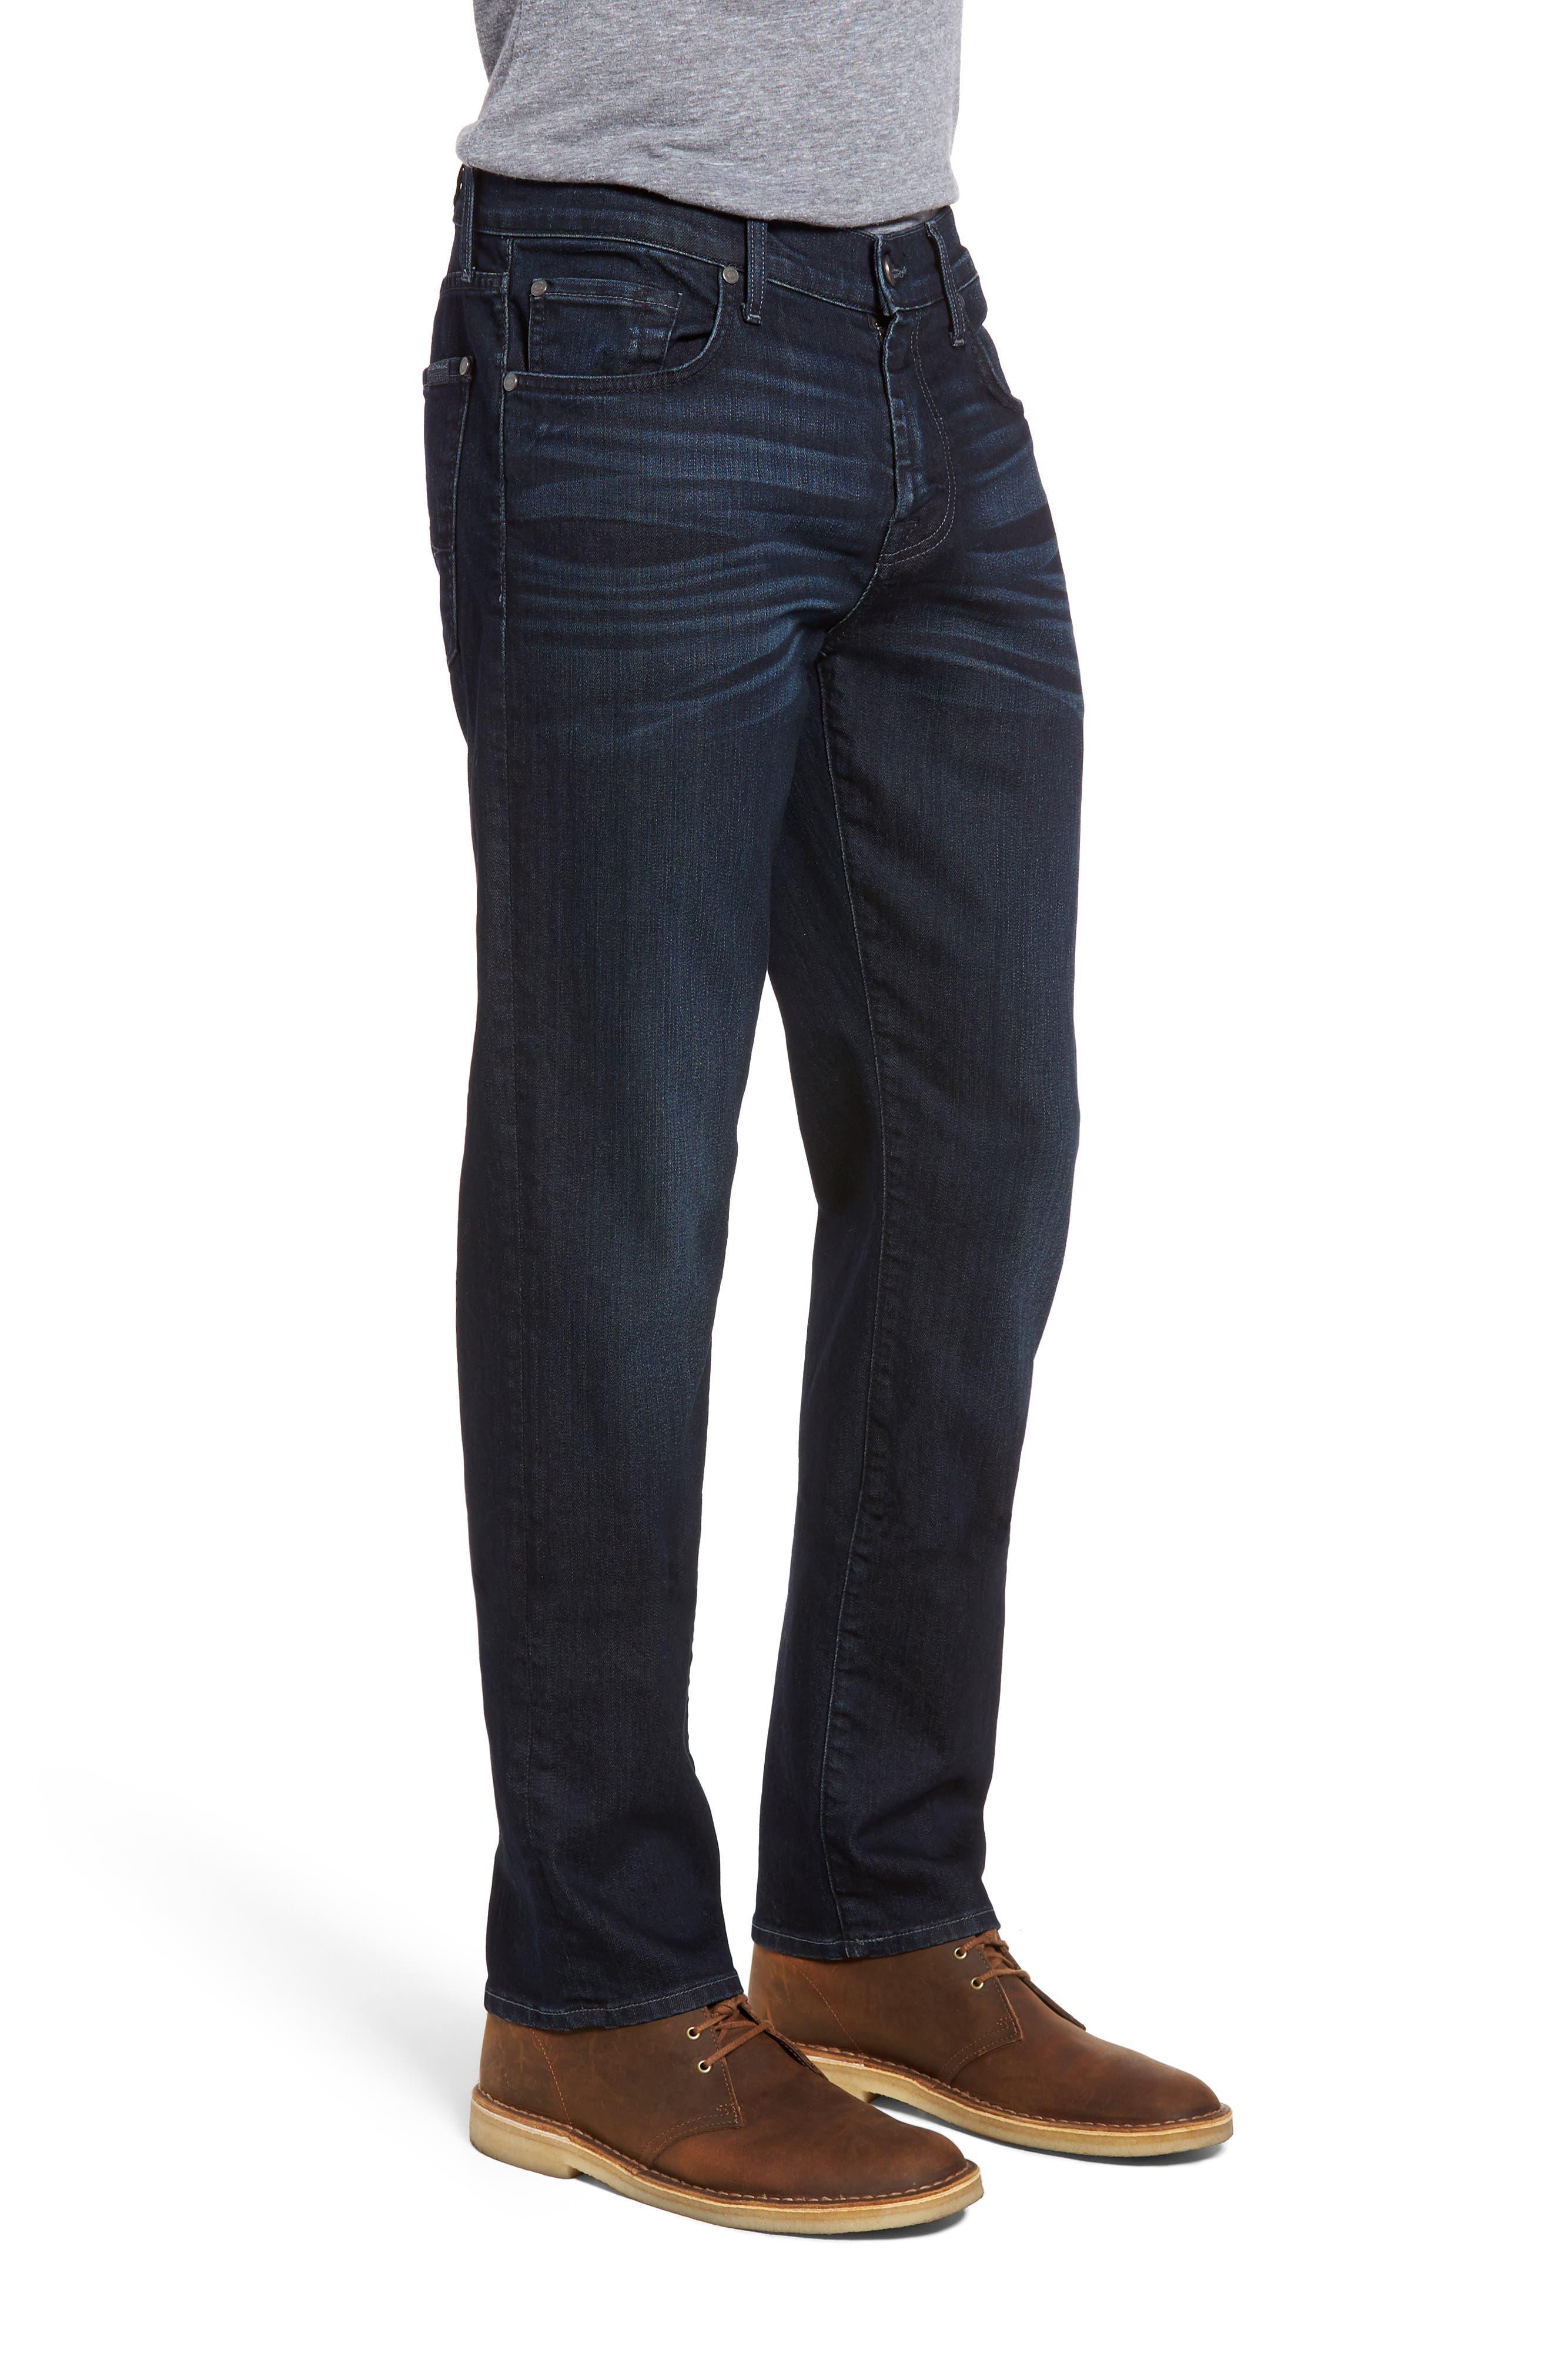 Slimmy AirWeft Slim Fit Jeans,                             Alternate thumbnail 3, color,                             Perennial